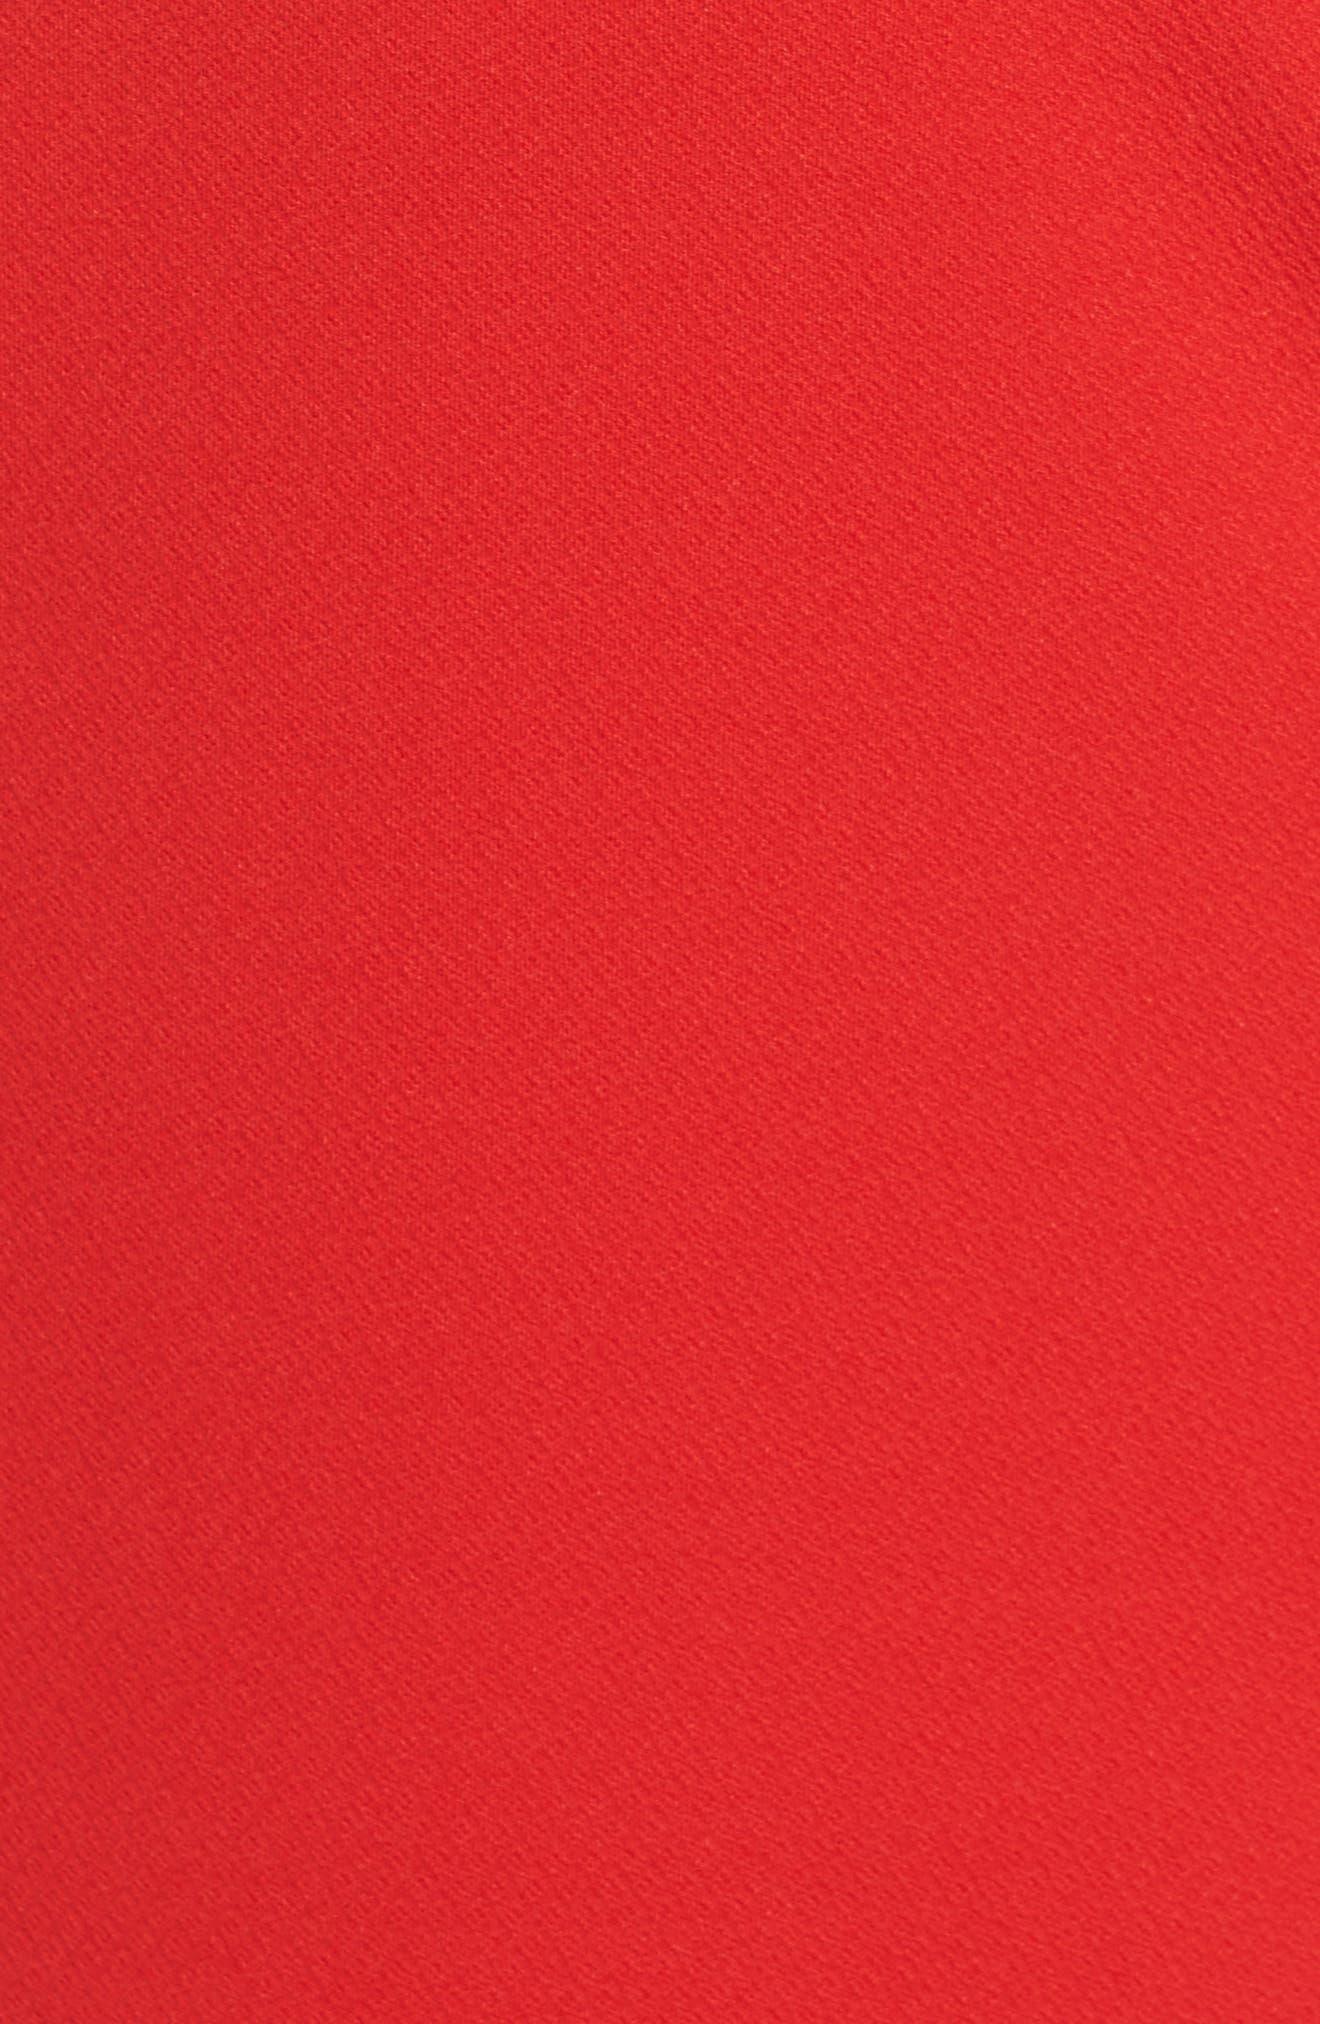 Camari Choker Collar Sheath Dress,                             Alternate thumbnail 5, color,                             Pagoda Red